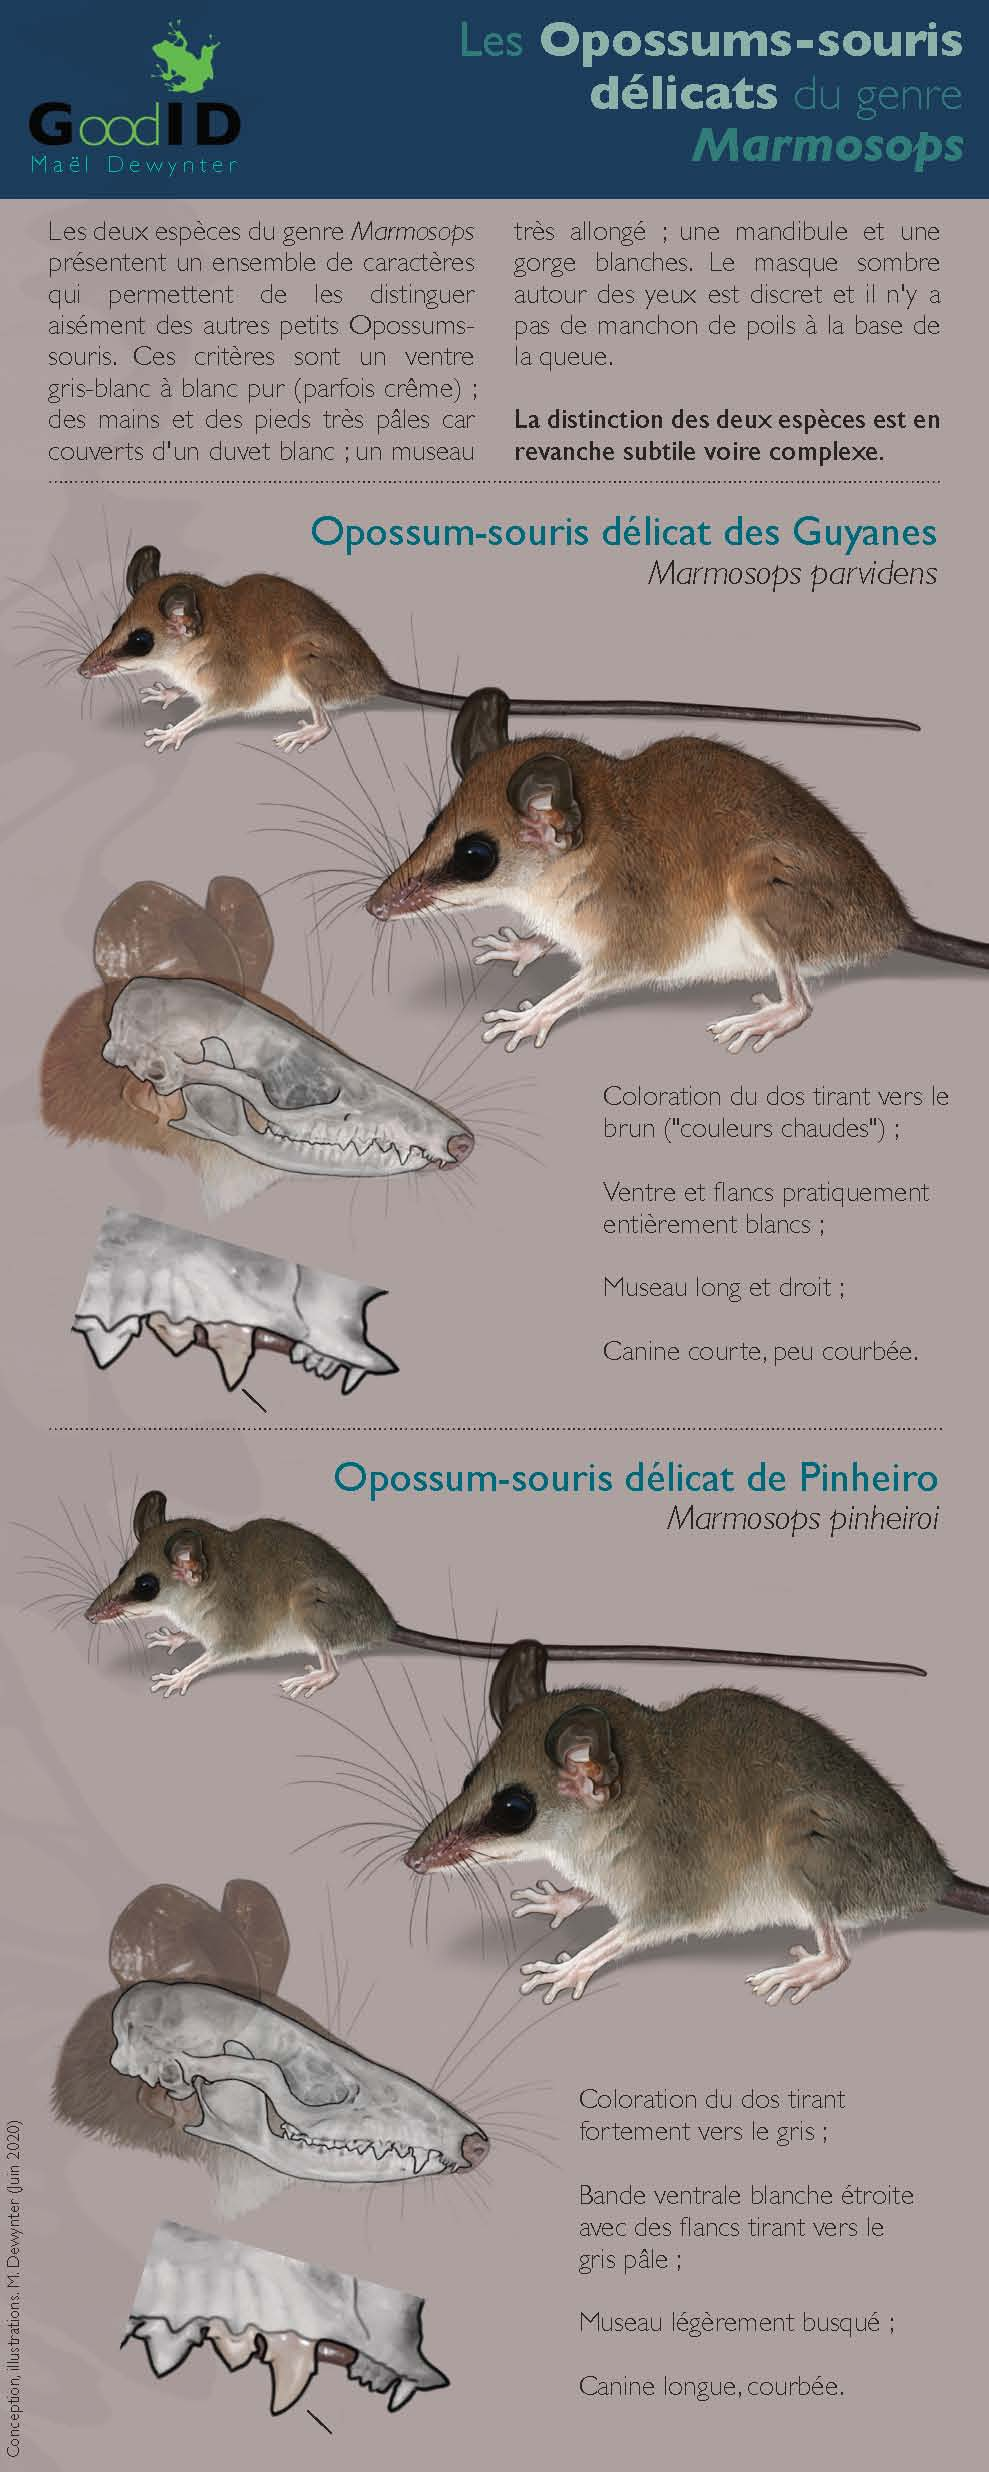 https://cdnfiles2.biolovision.net/www.faune-guyane.fr/userfiles/Documentsdivers/Mammifres/IdentificationdesMarmosopsv2020.jpg